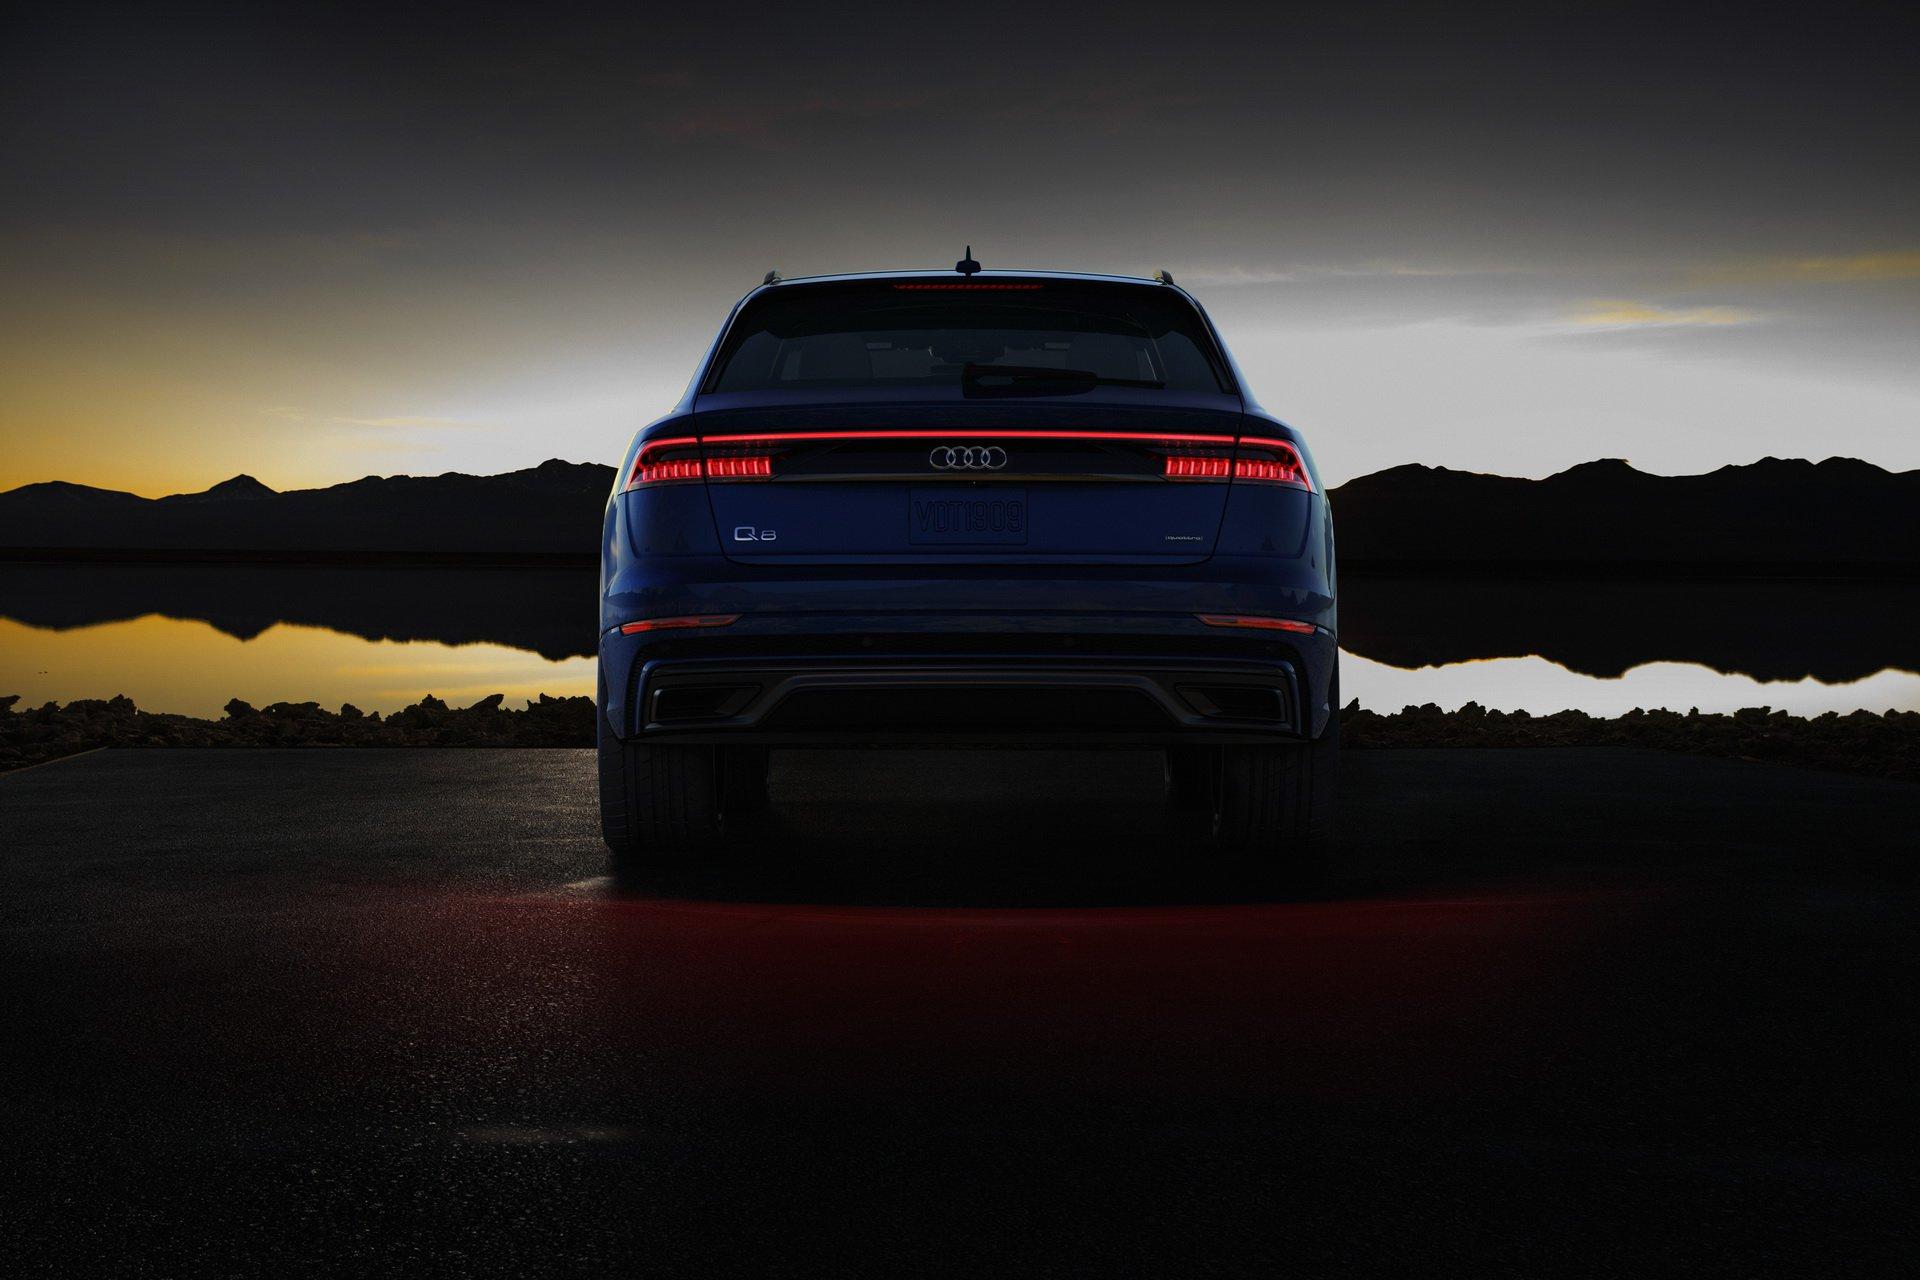 2019 Audi Q8 Added To U.S. Lineup, 3.0 TFSI V6 Priced At $67,400 - autoevolution